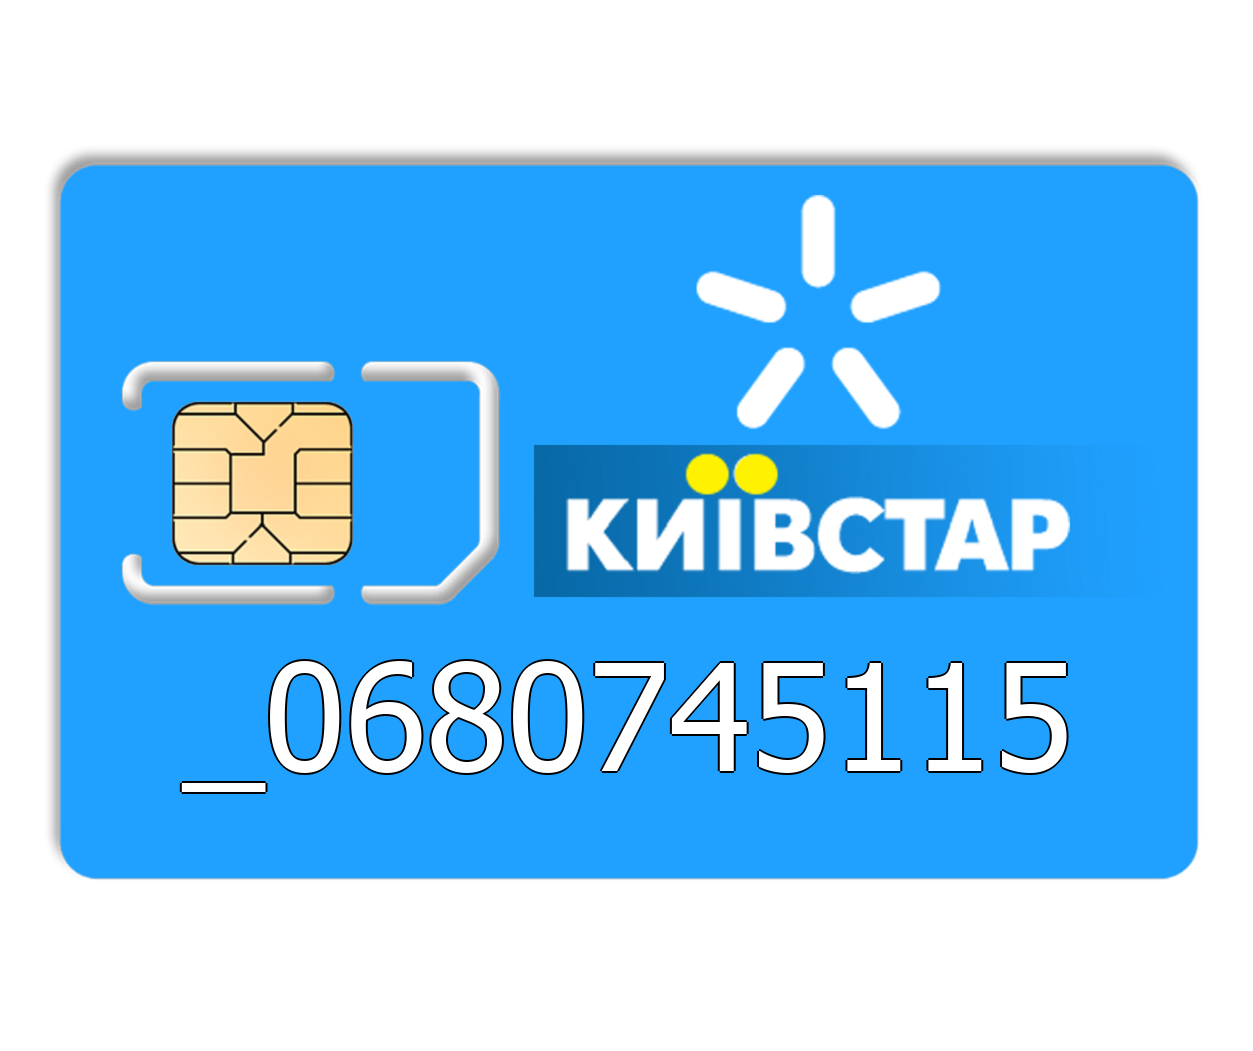 Красивий номер Київстар 068-074-51-15